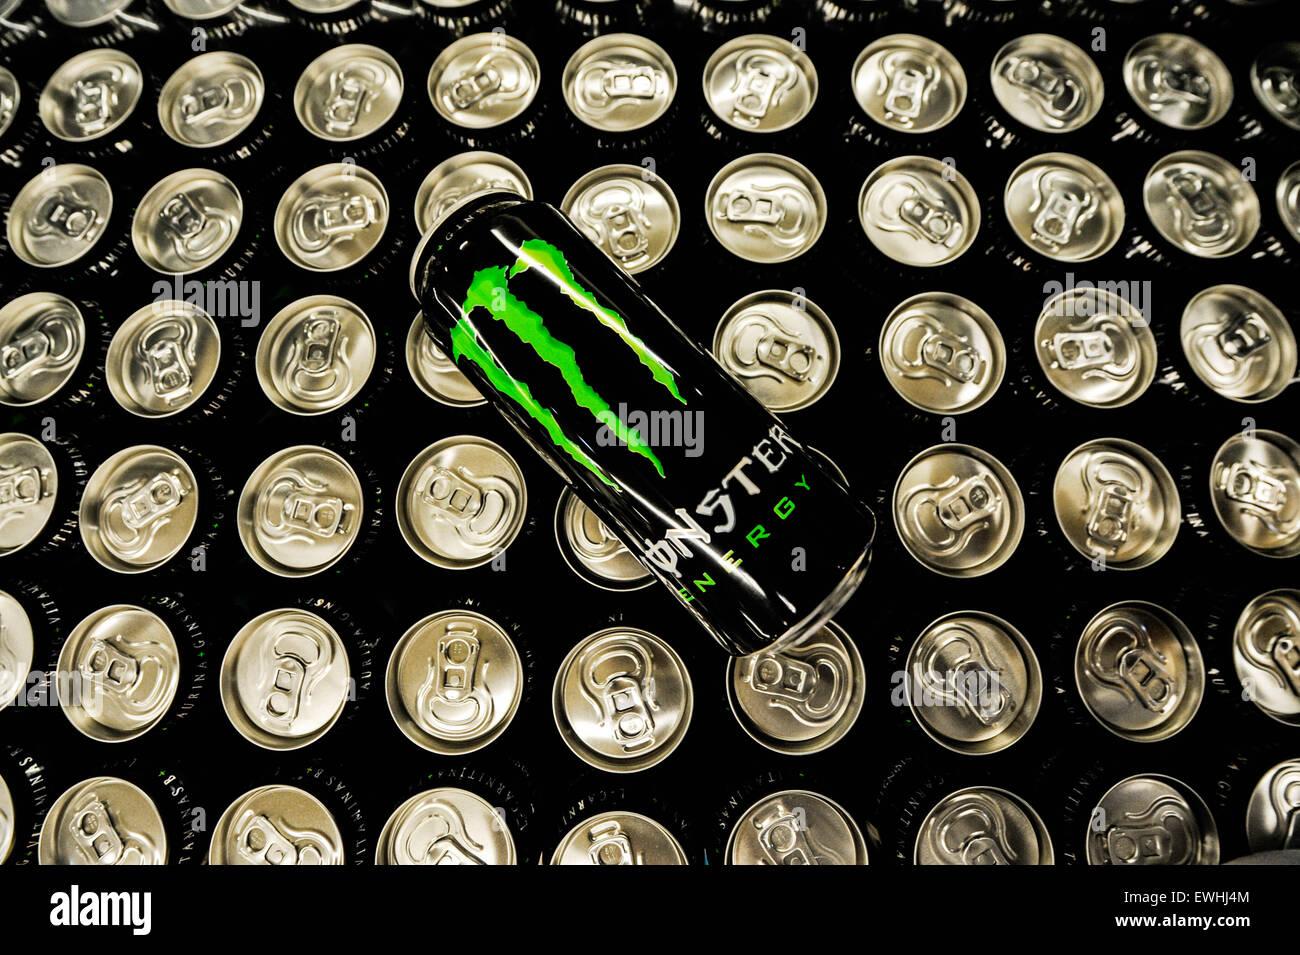 Monster energy Drink - Stock Image